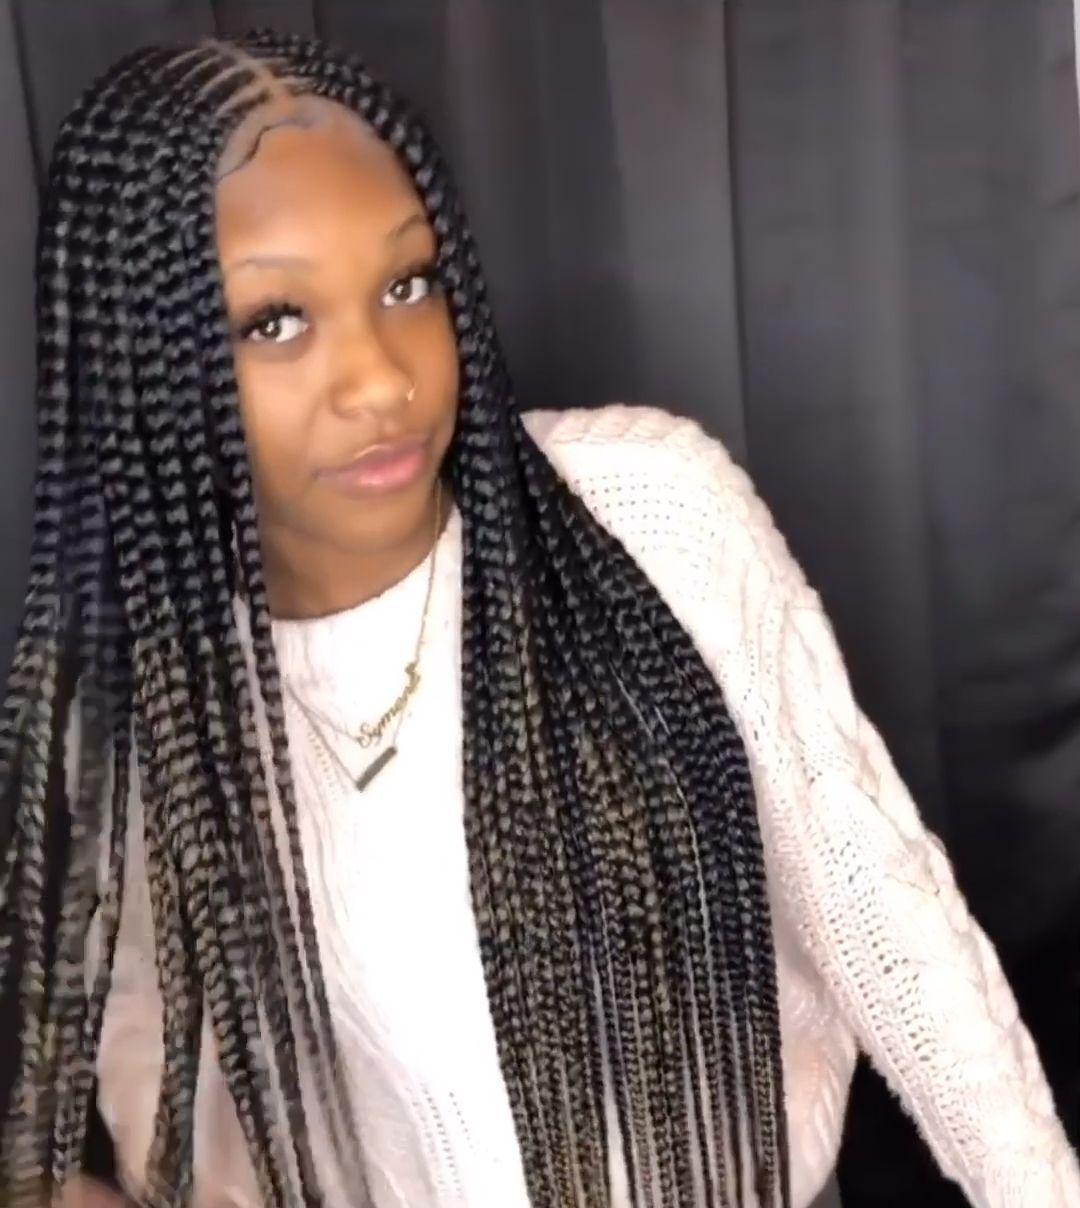 Pin By Sarah Evans On Scarlet Blog In 2020 Cornrow Hairstyles Black Girl Braided Hairstyles Braided Hairstyles